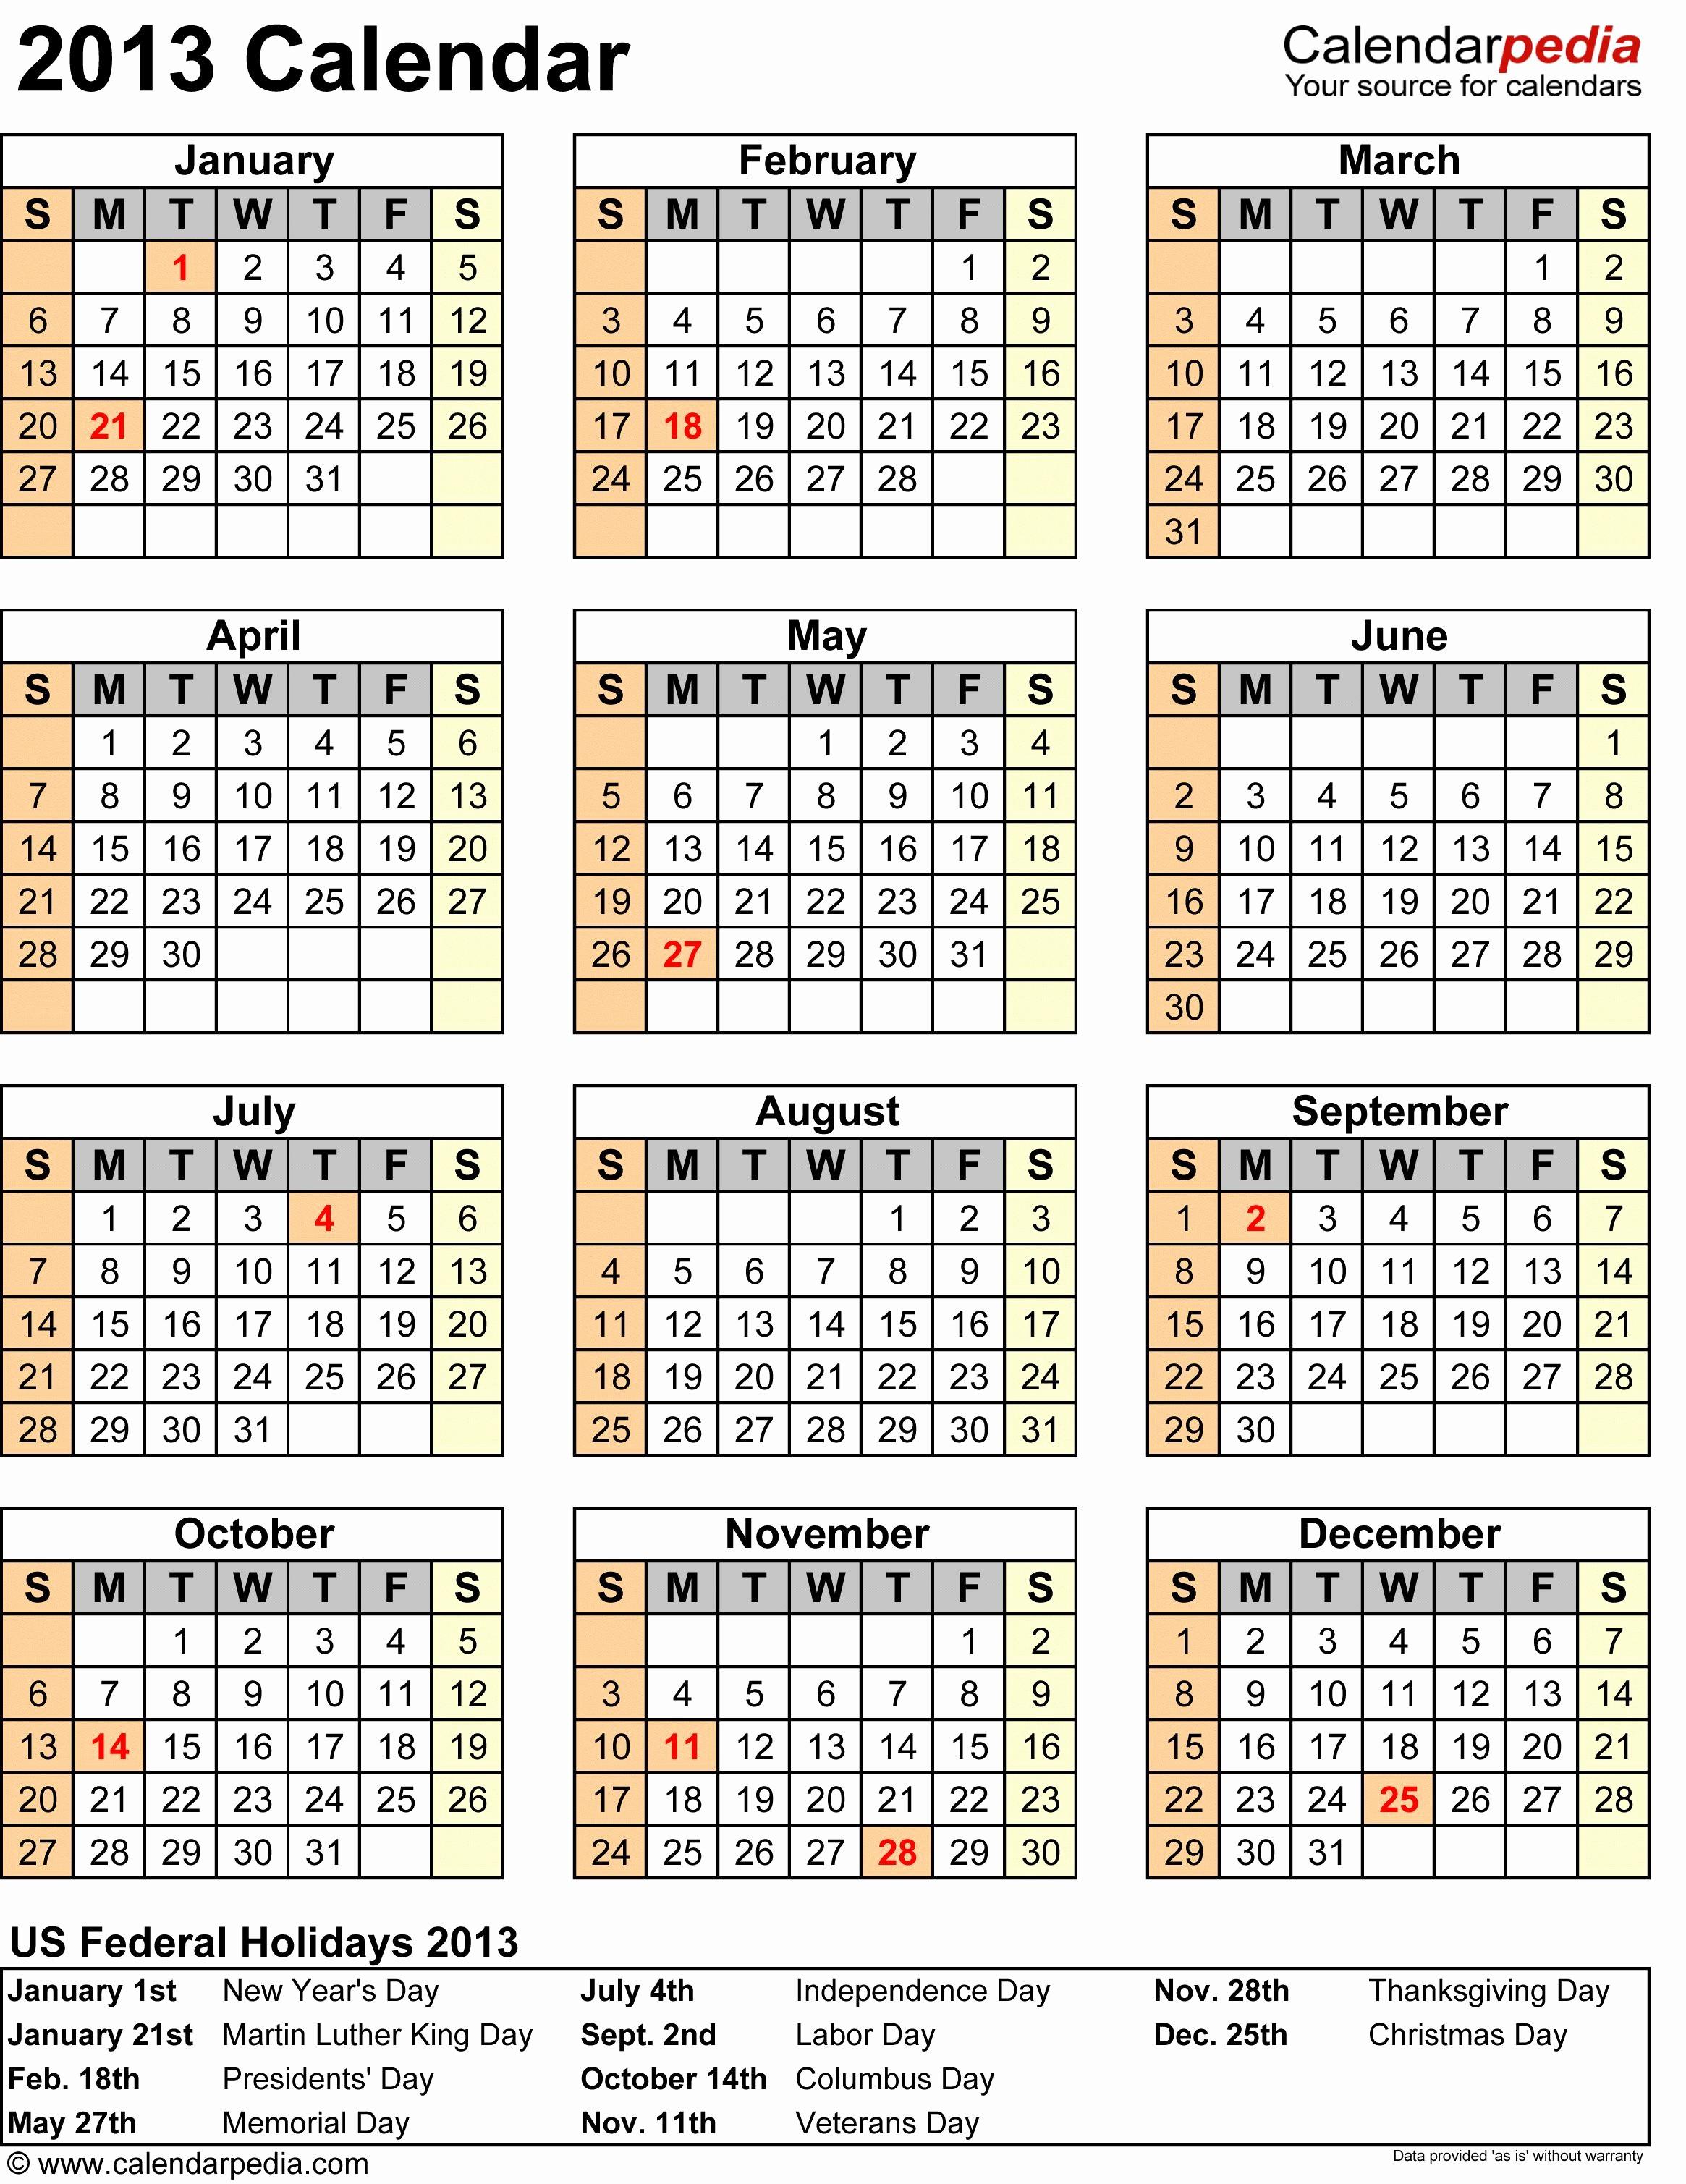 2013 Calendar Printable One Page Luxury 2013 14 Calendar Uk